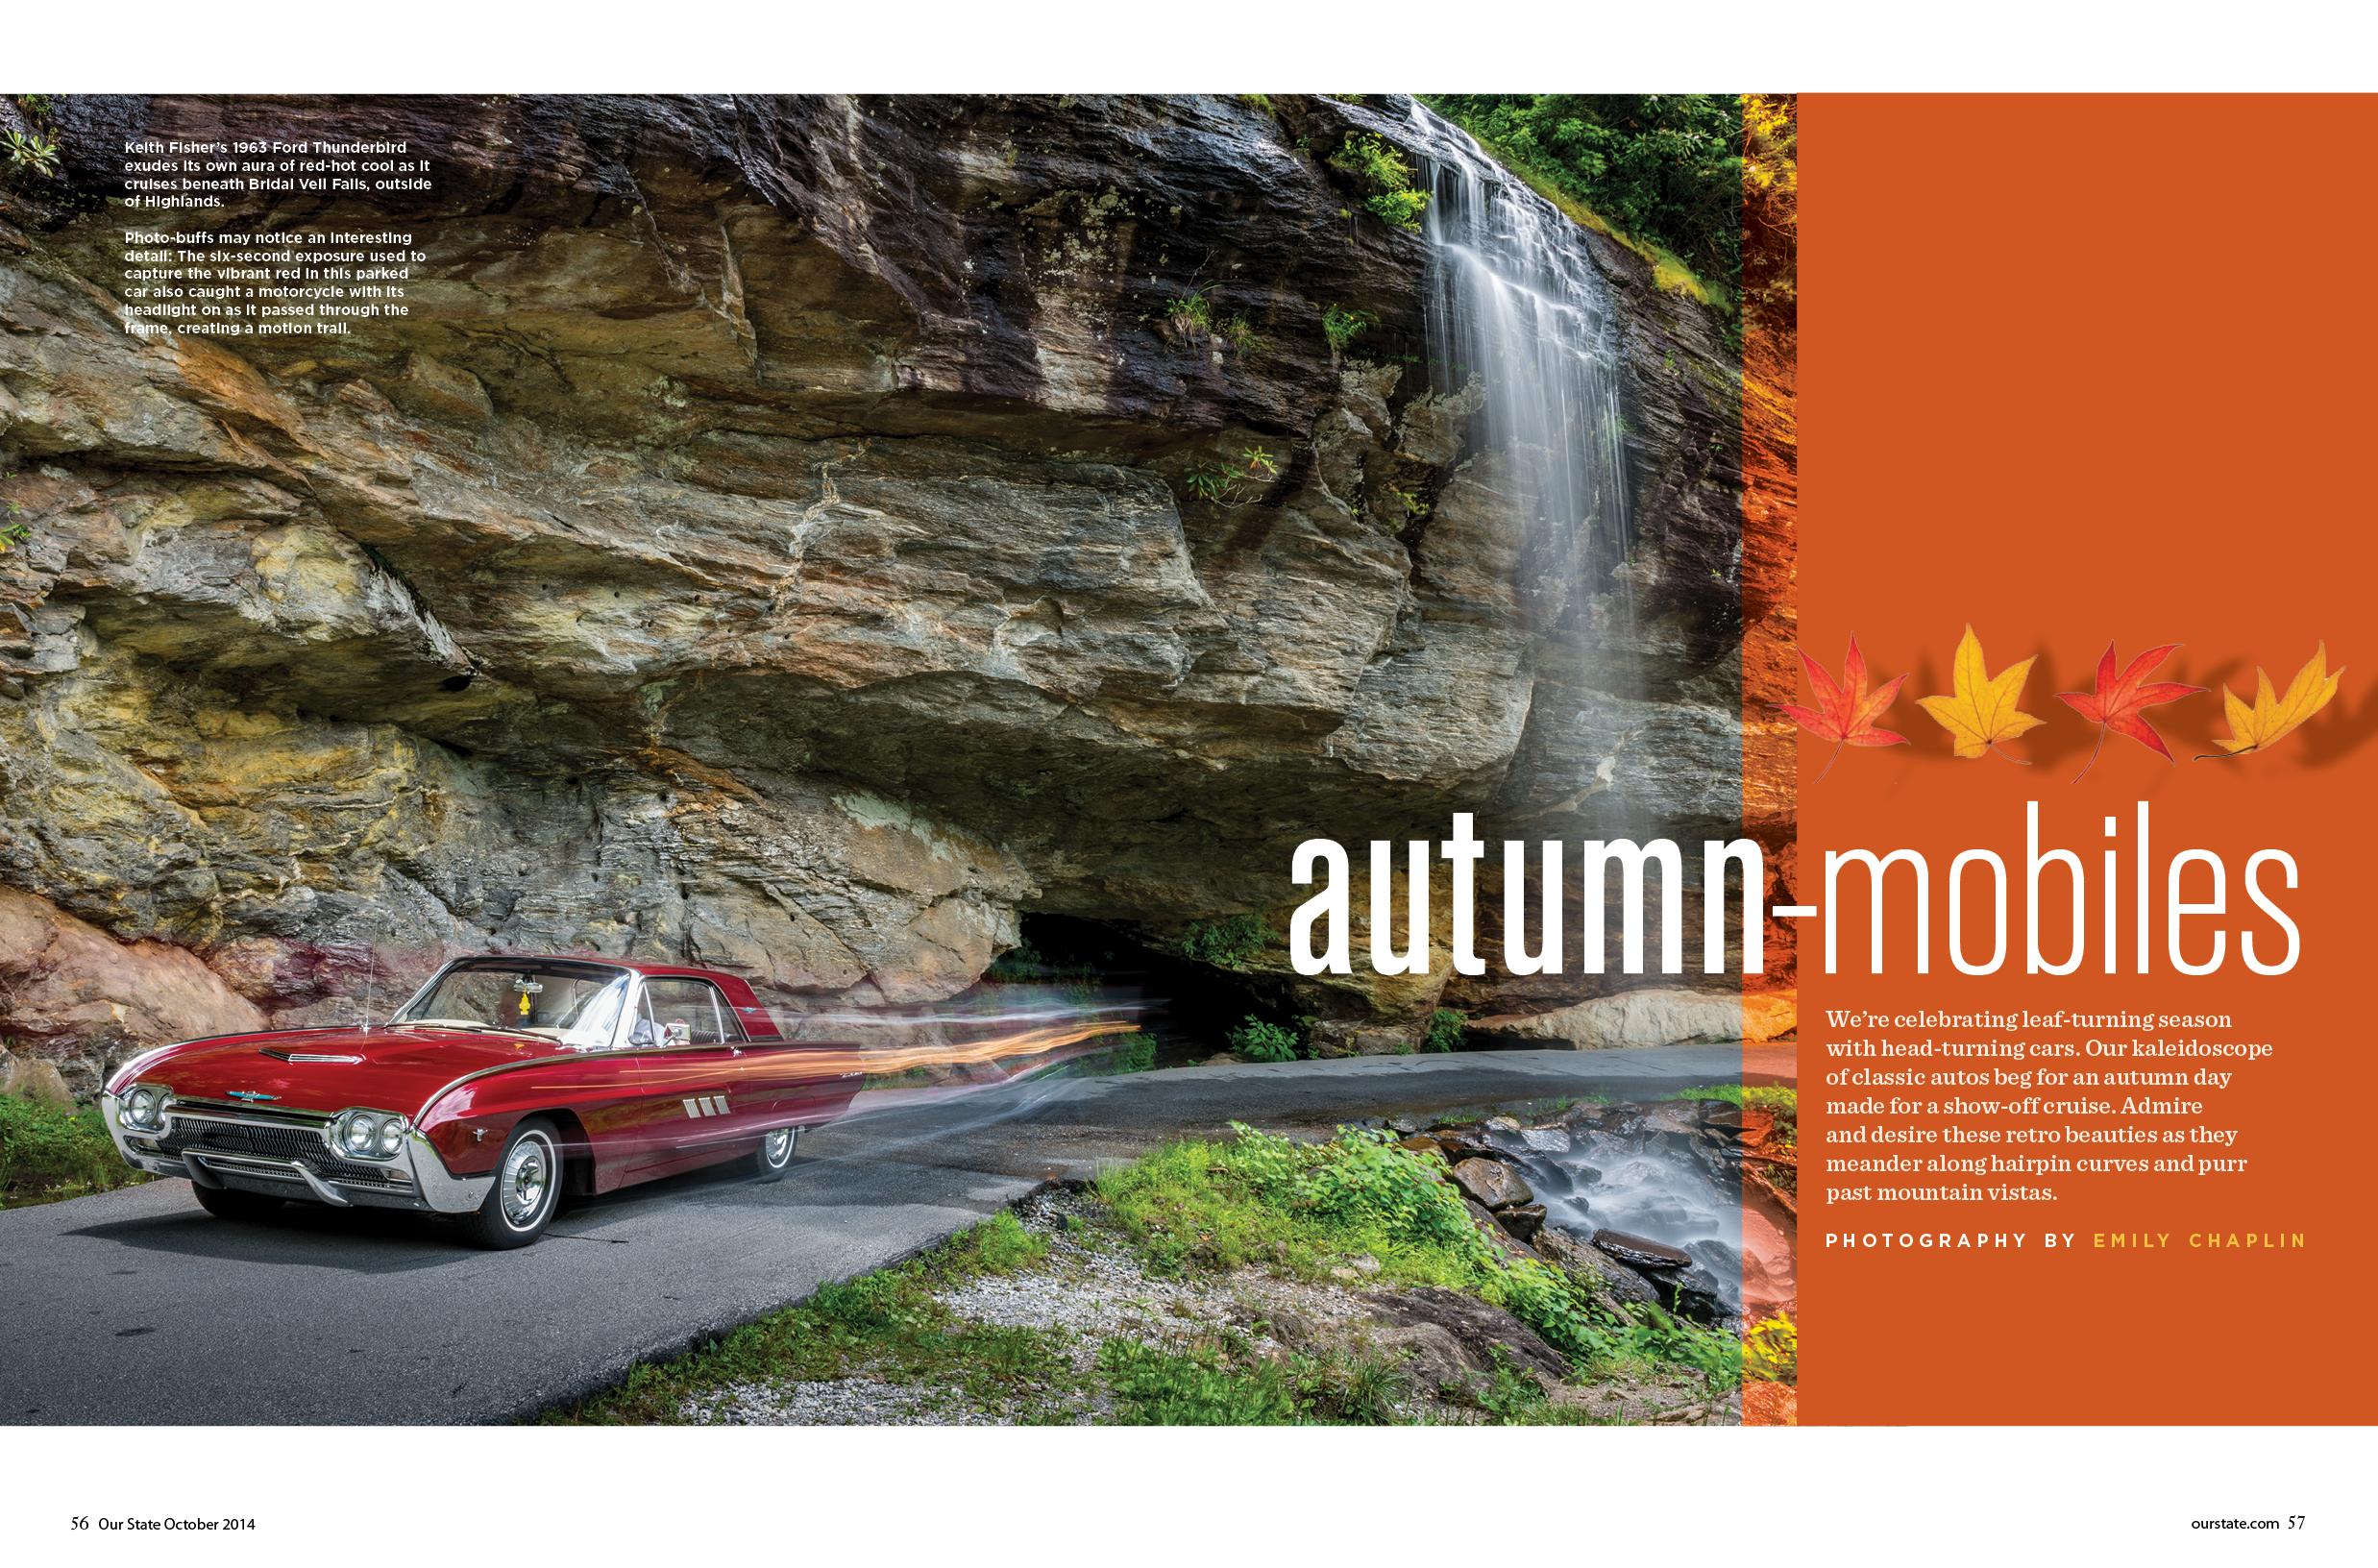 Autumn-mobiles: Celebrating classic cars in classic North Carolina ...